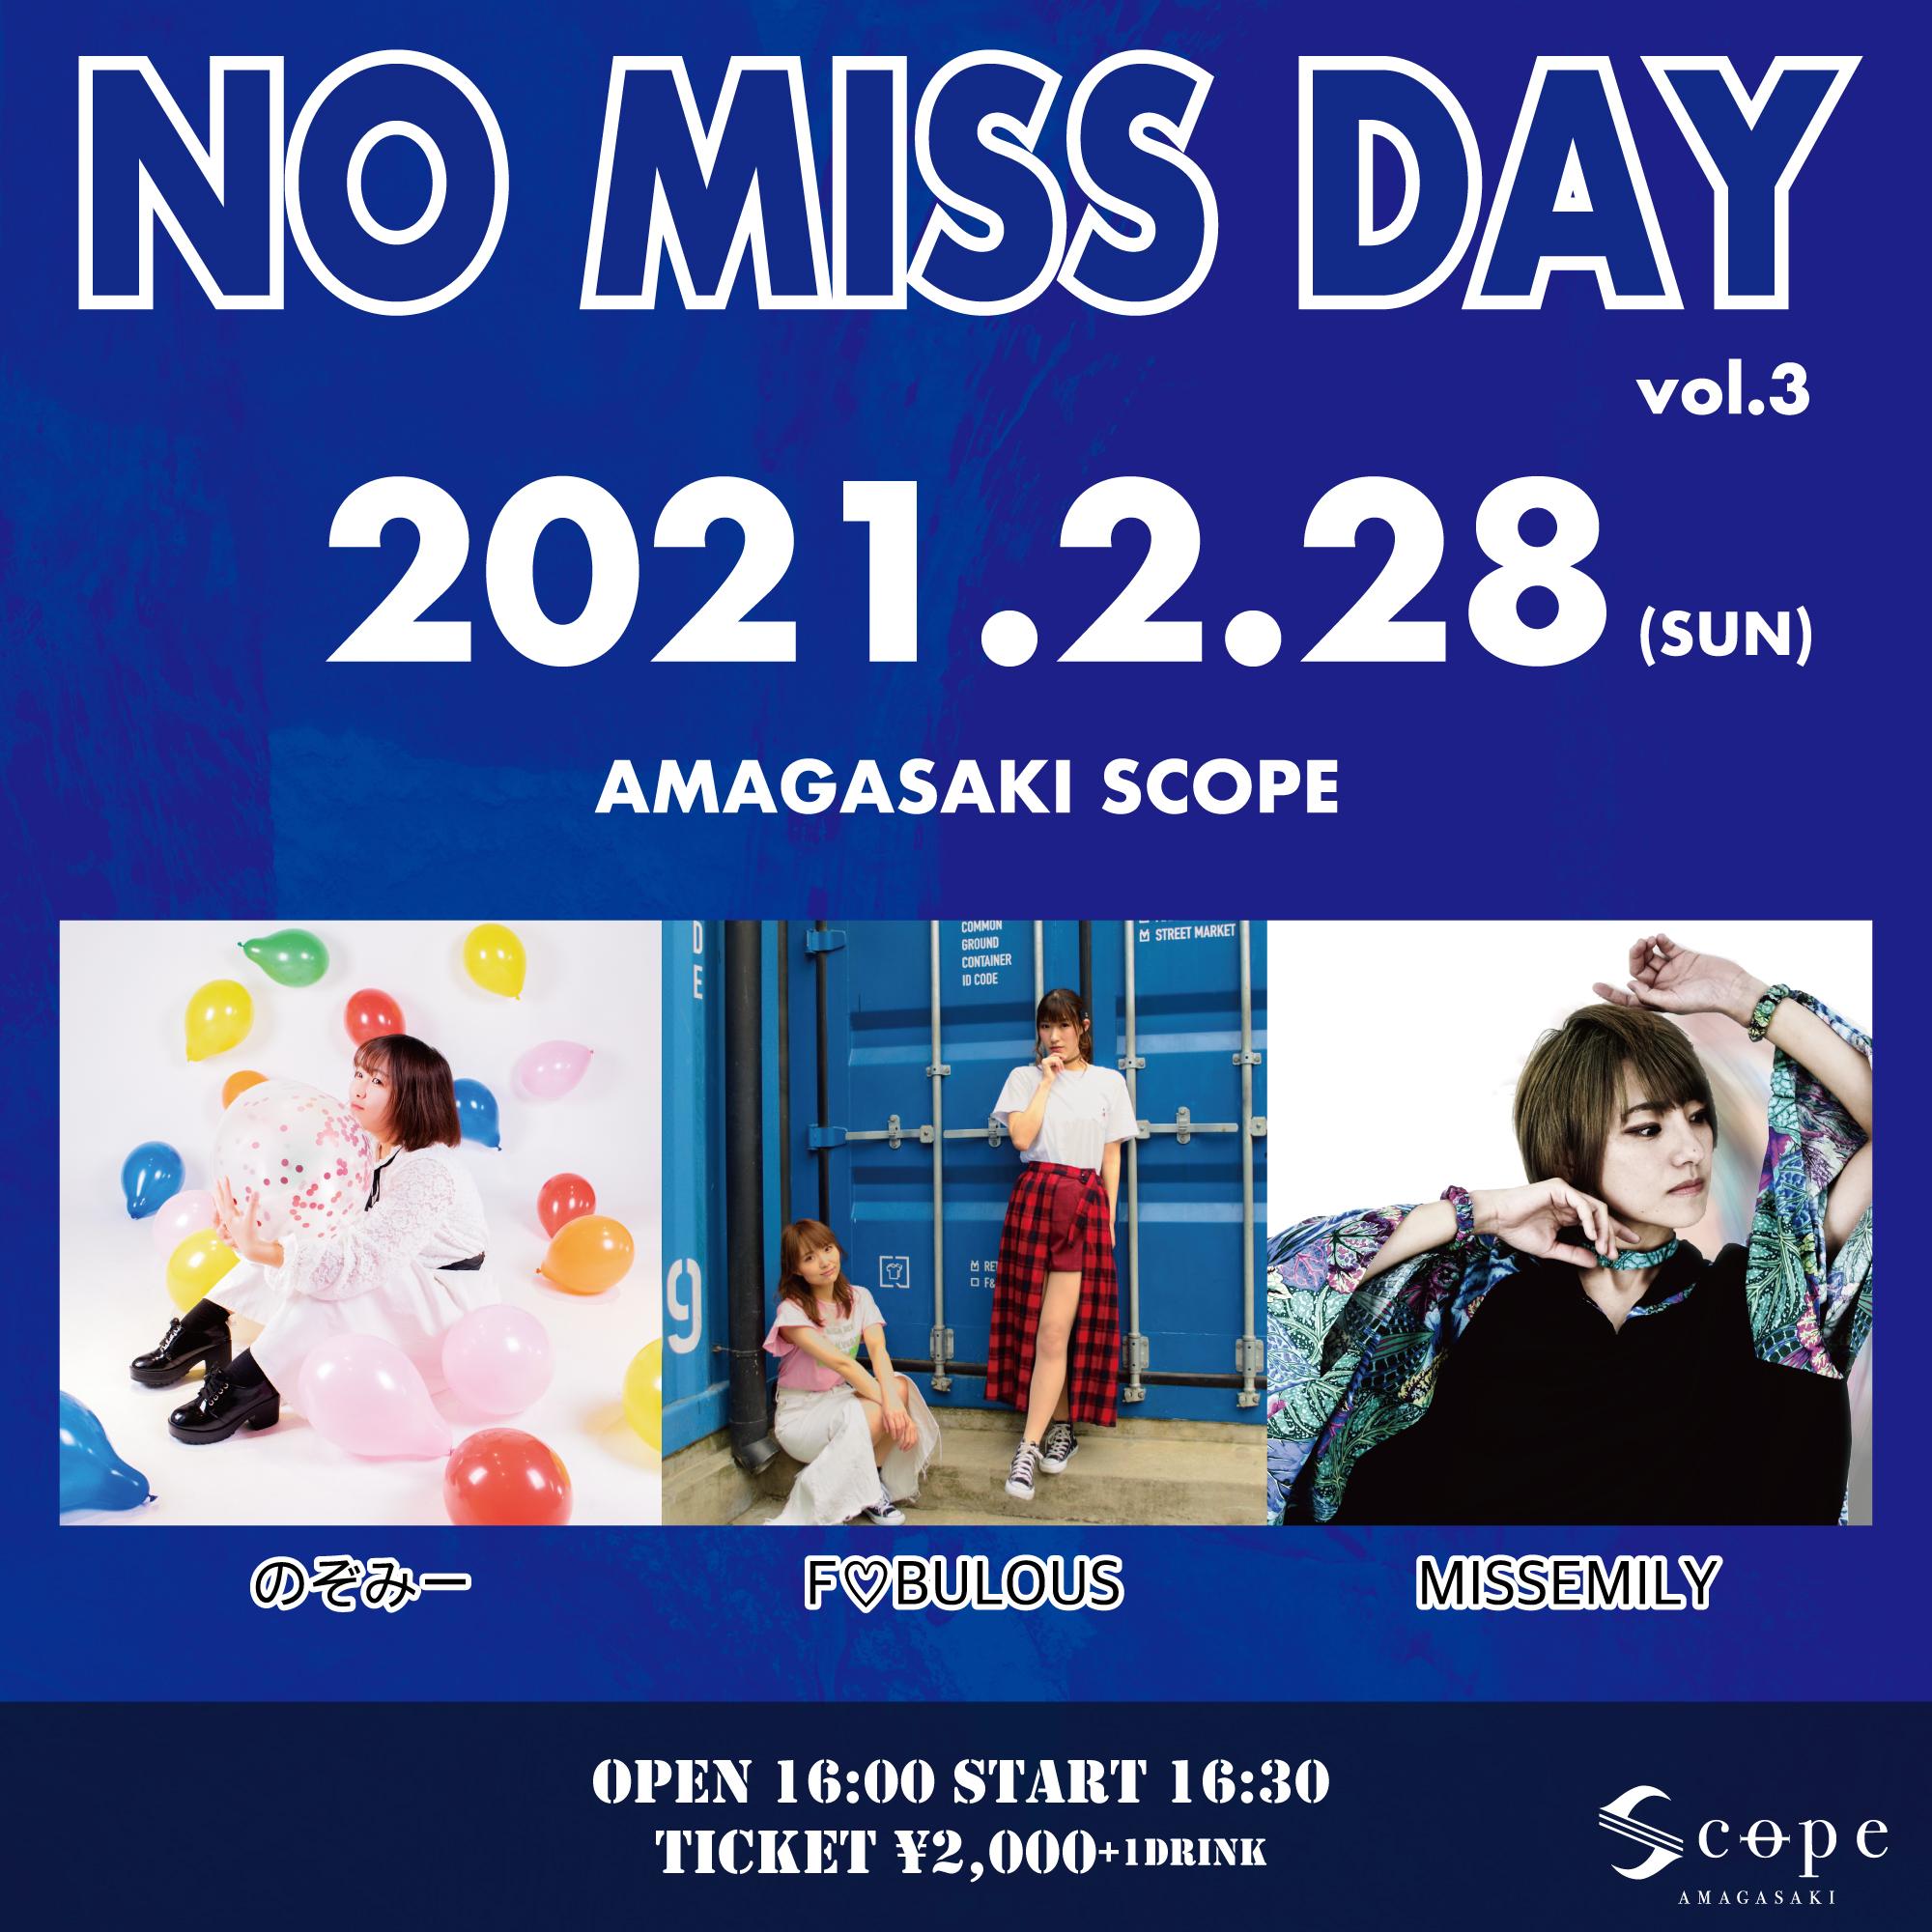 2/28 NO MISS DAY vol.3